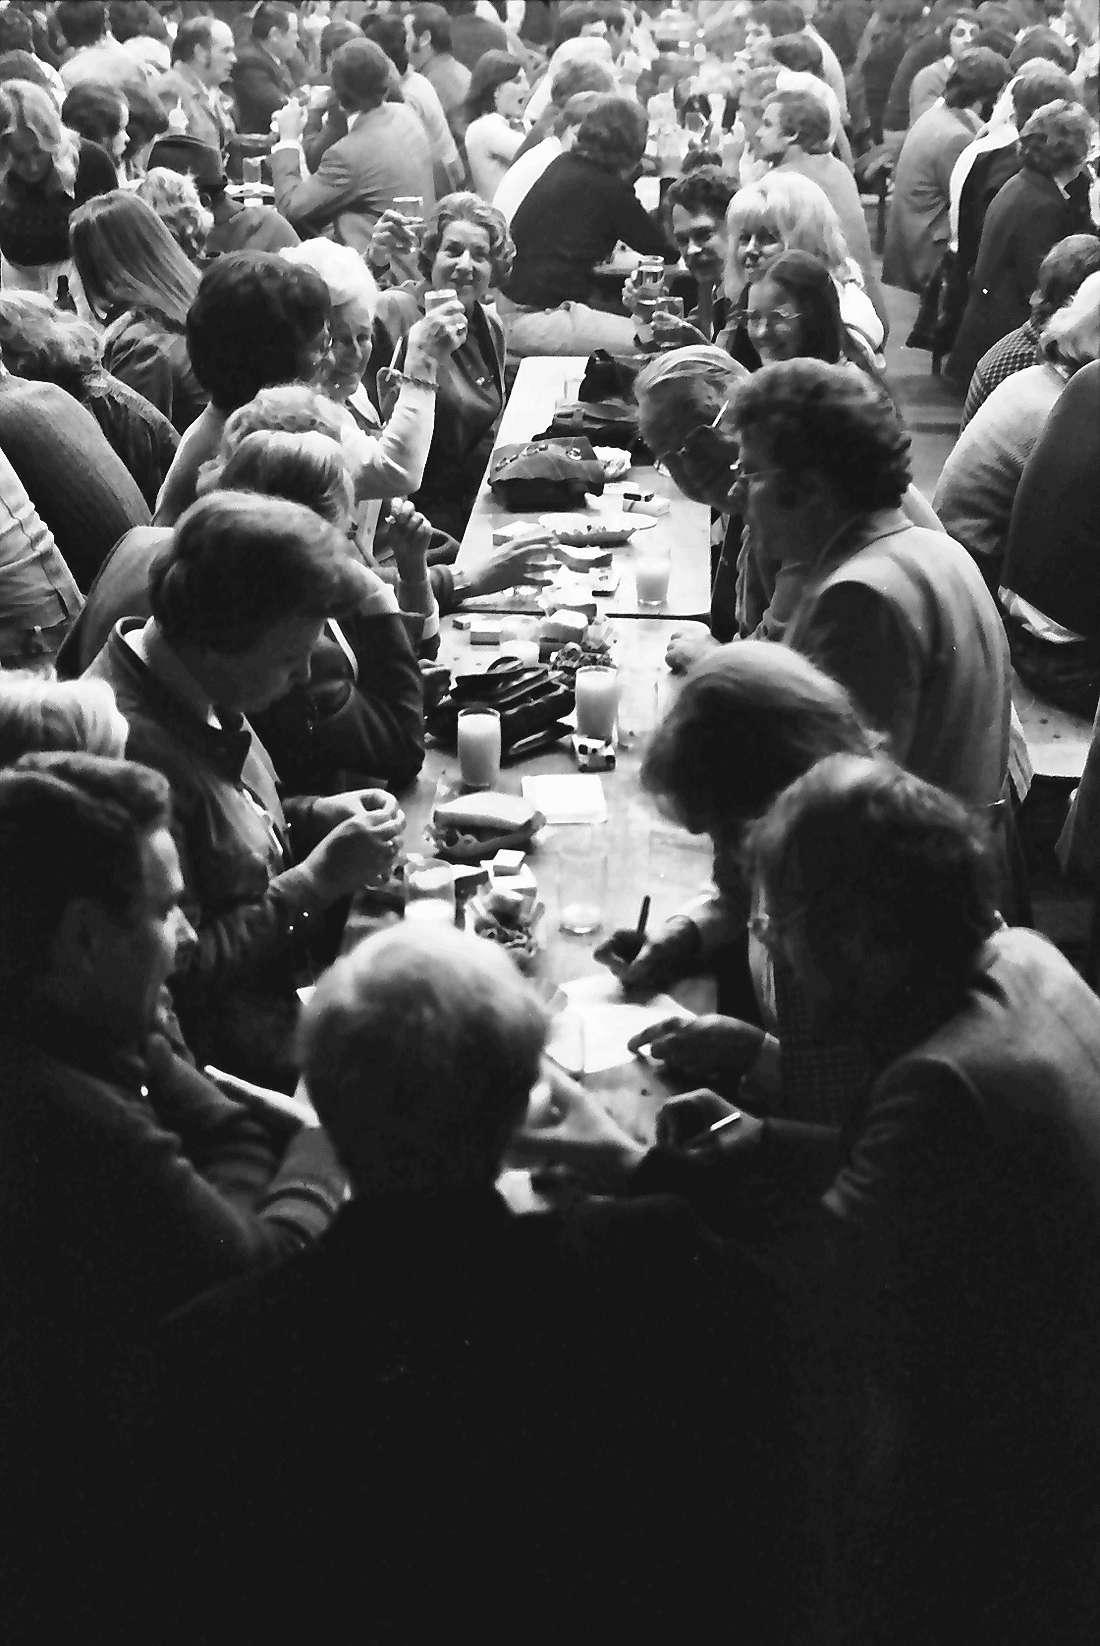 Munzingen: Dreschschopf; Gruppen an Tischen; mit Journalisten, Bild 1